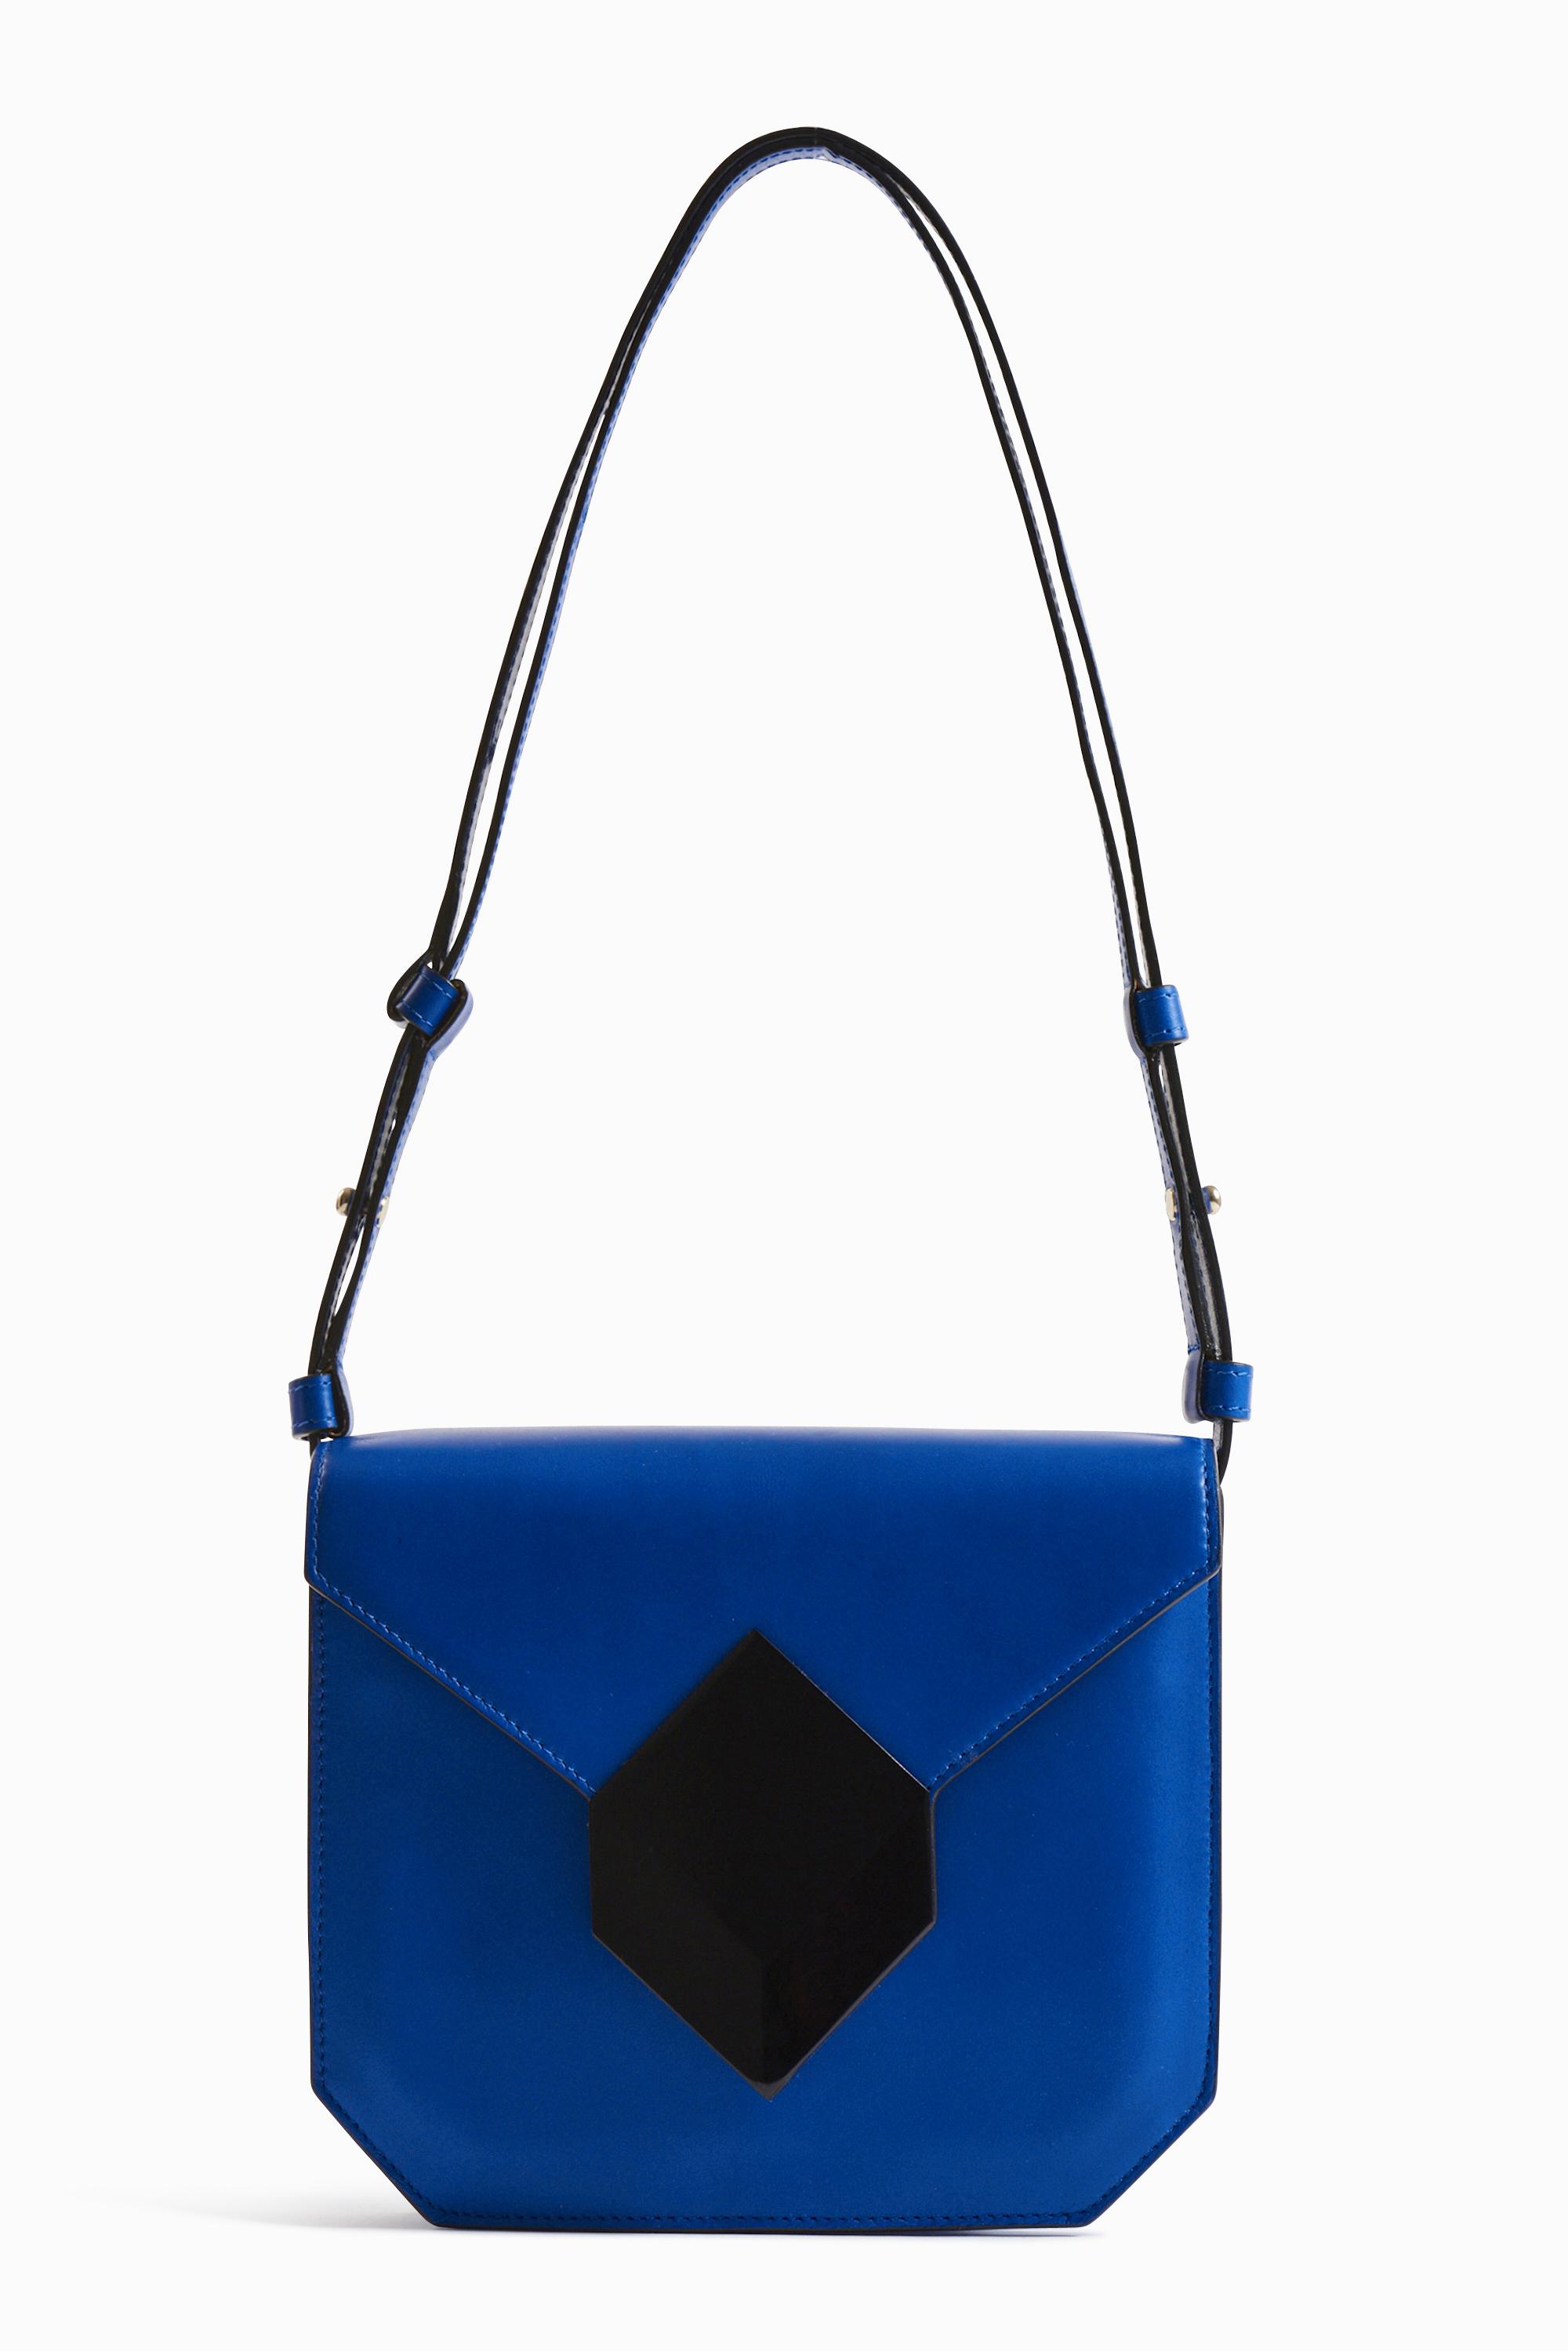 """Prism"" bag, PIERRE HARDY."